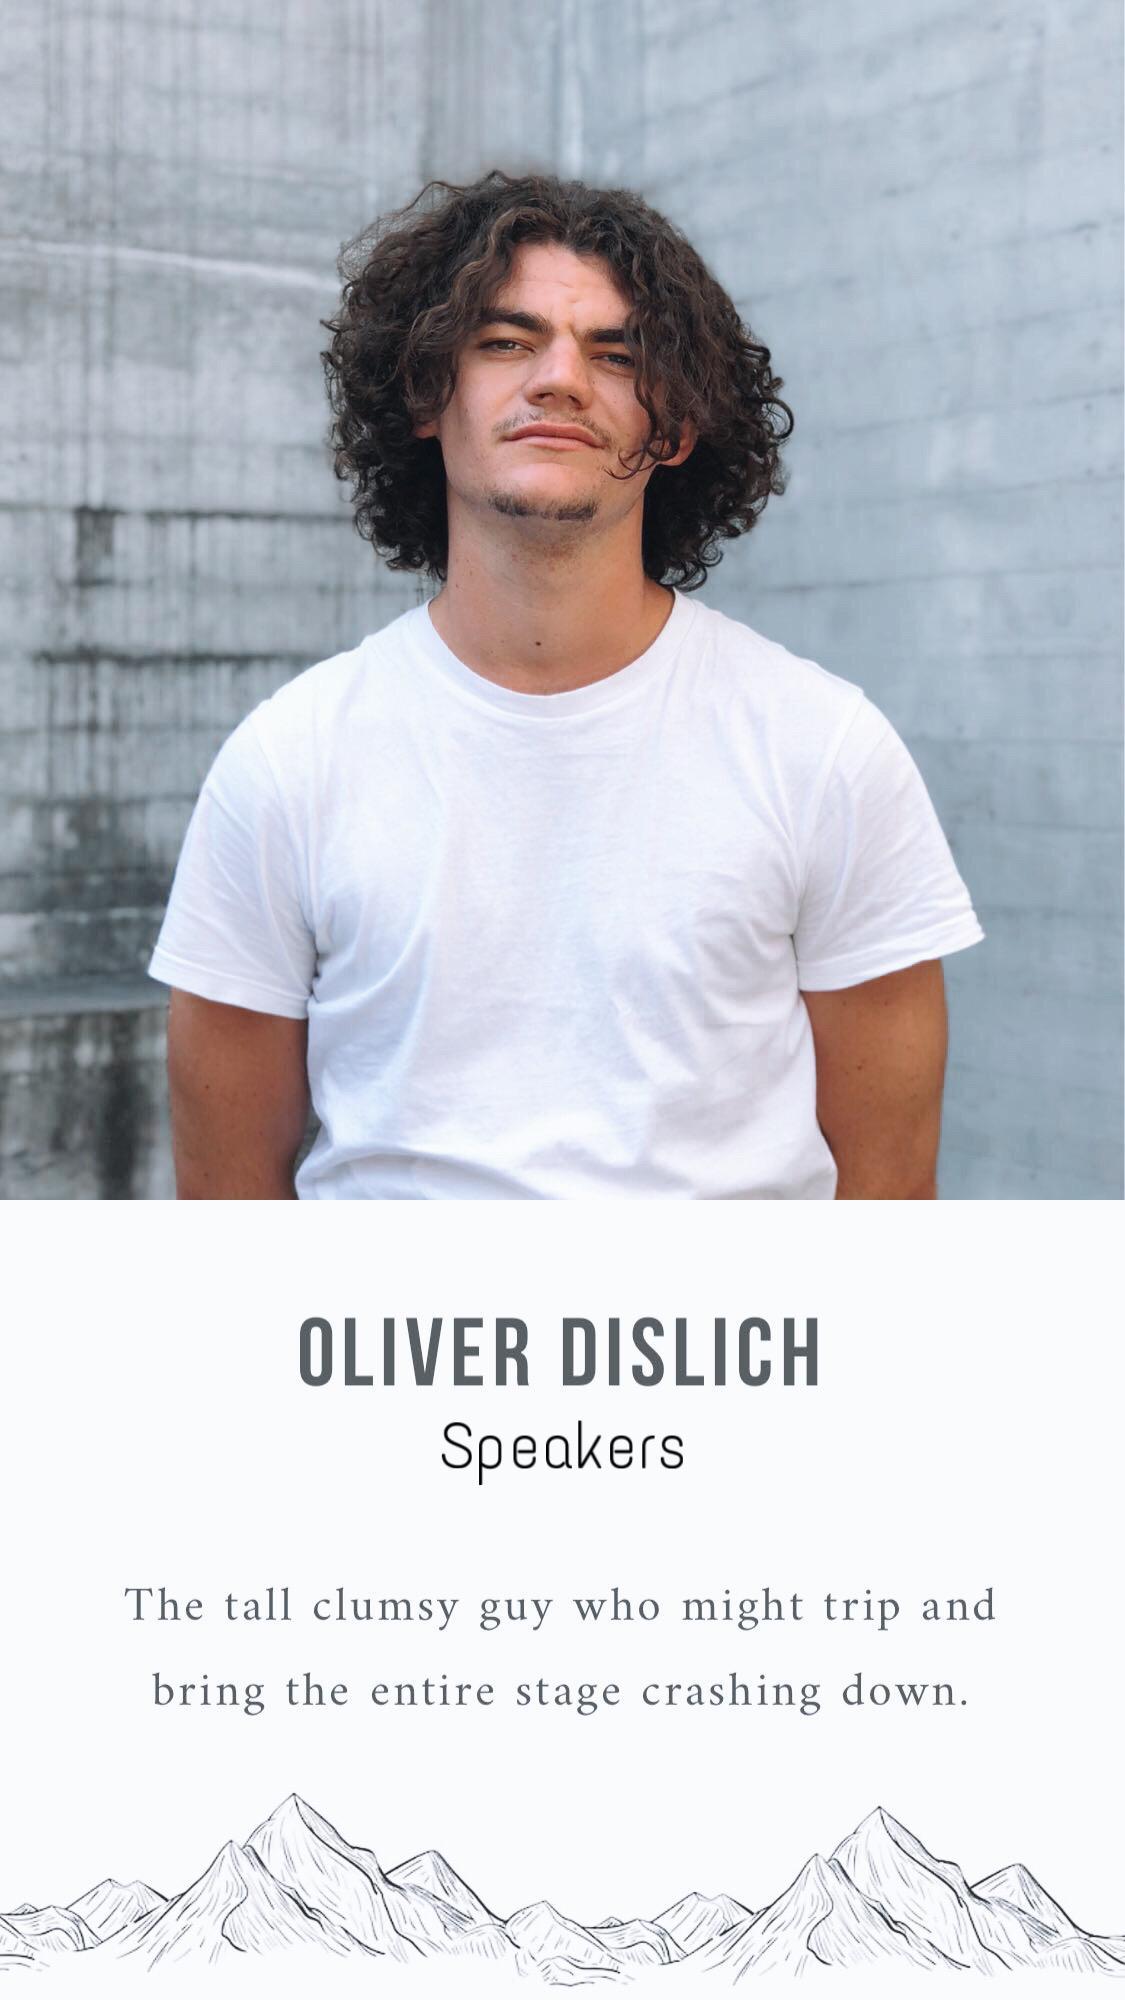 Speakers, Oliver Dislich.jpg